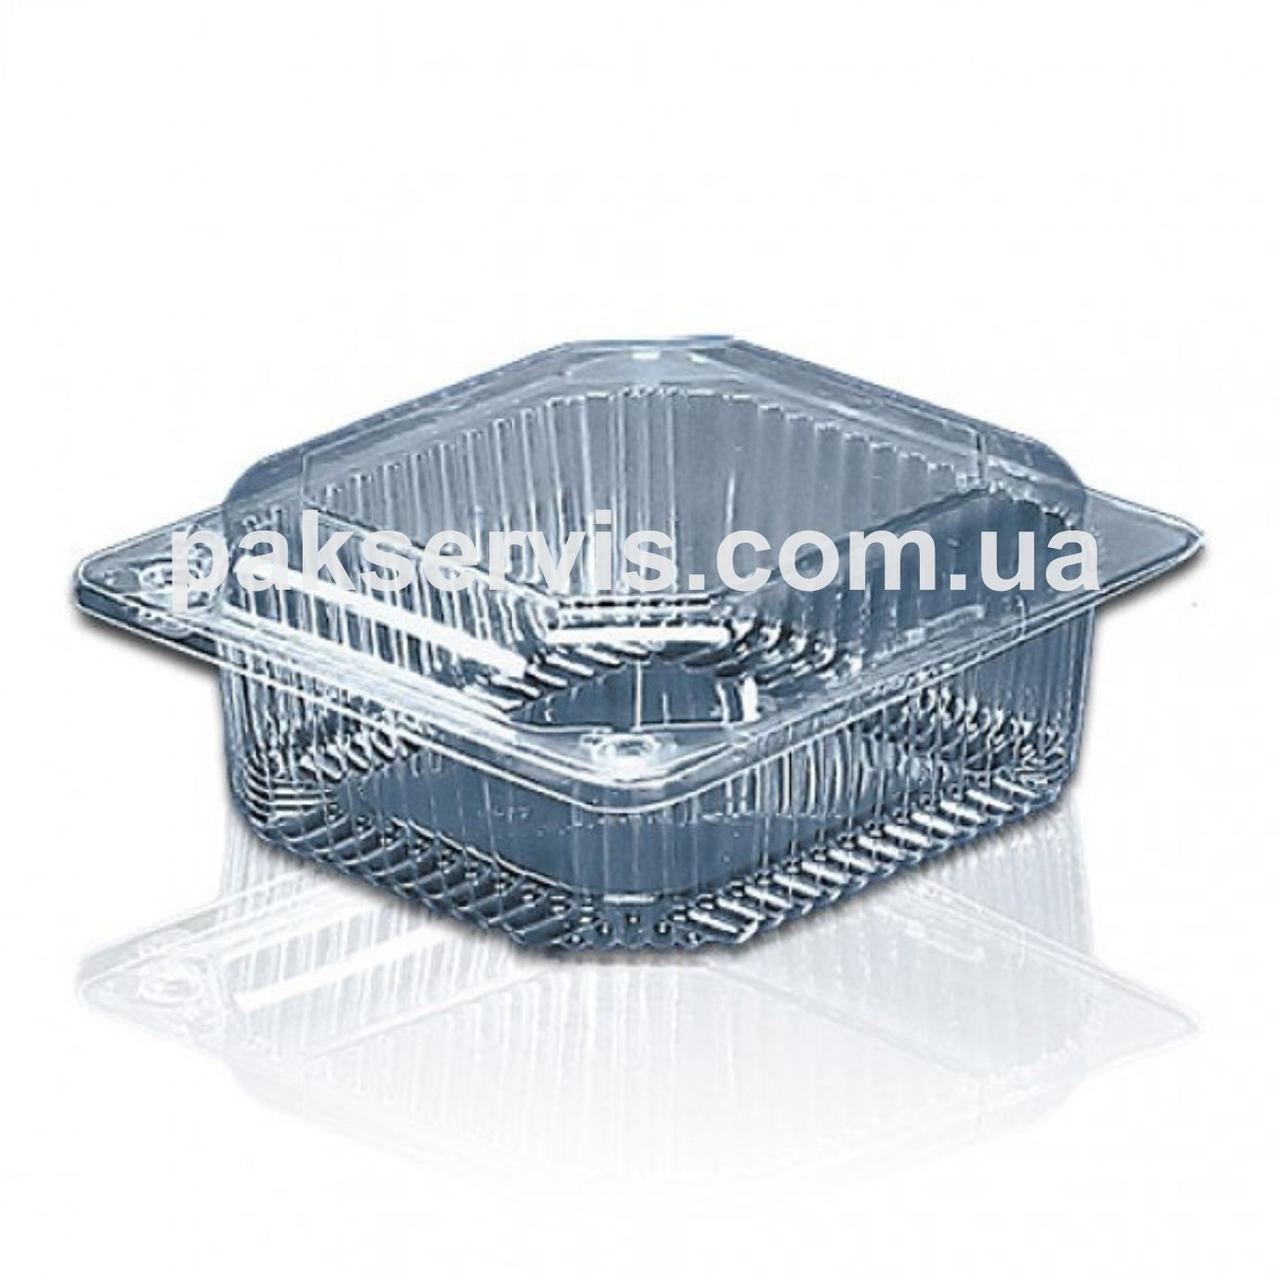 Упаковка ПС-110 (1095мл) 1/600